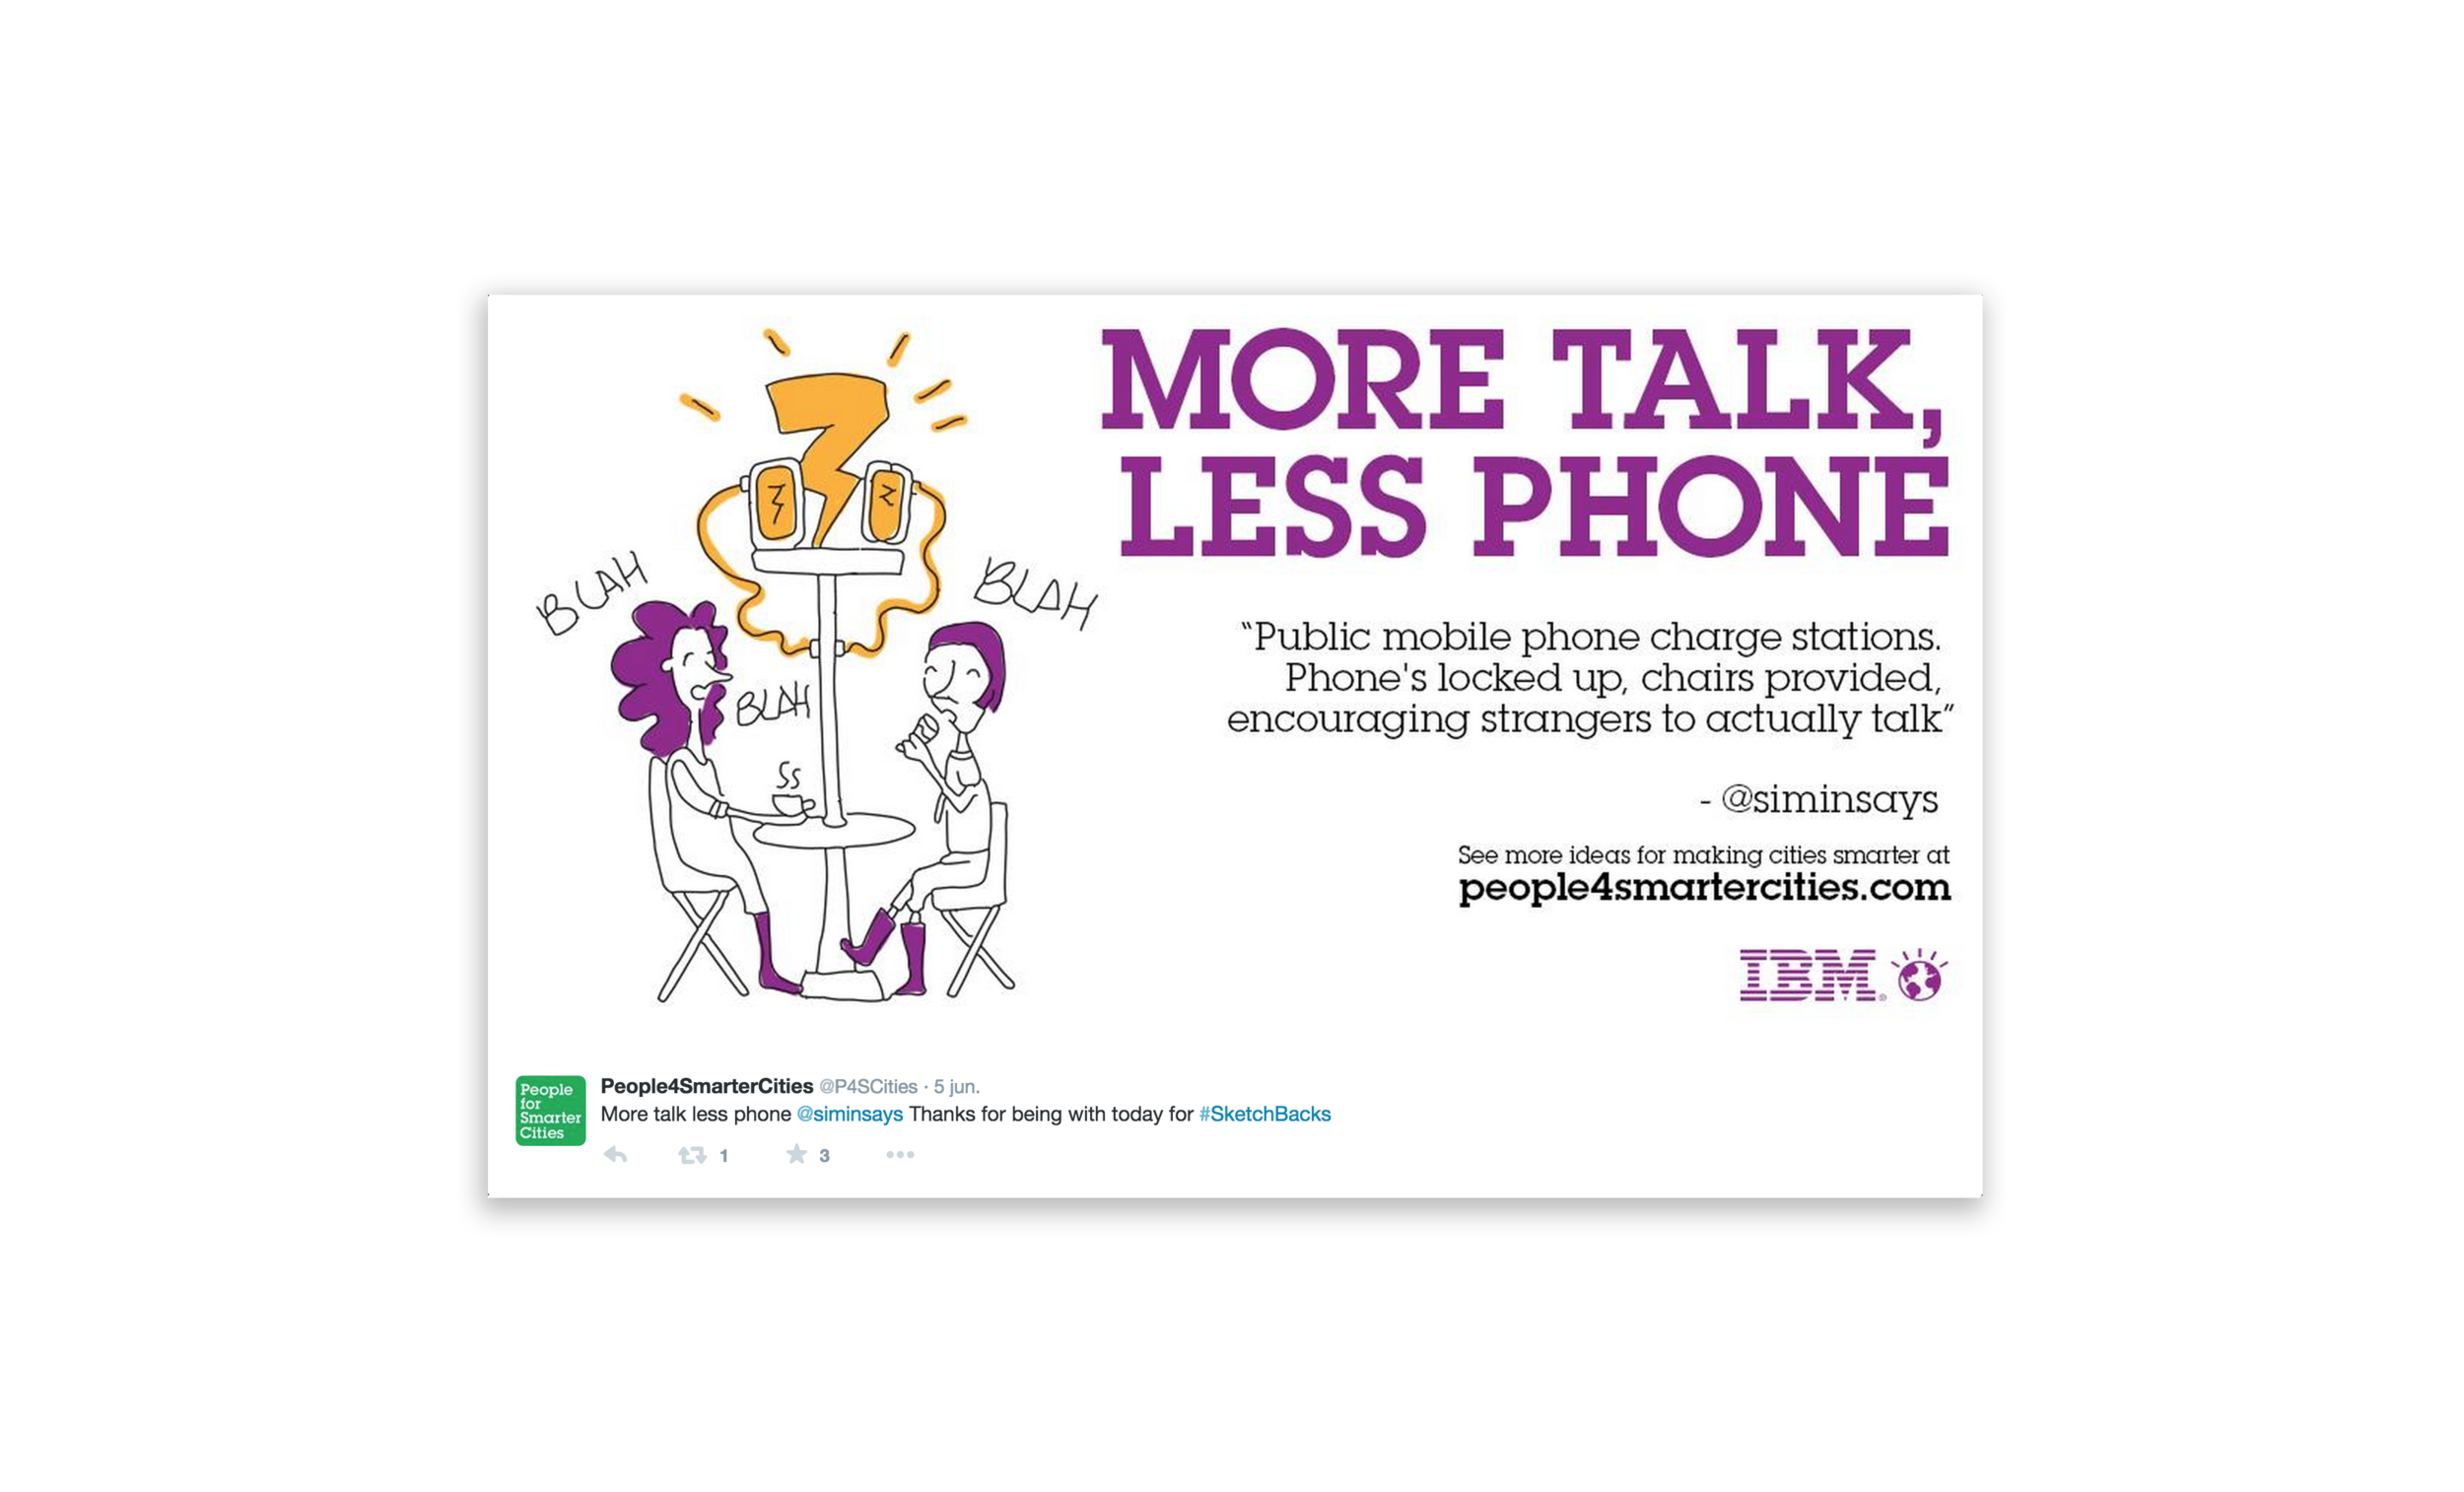 MoreTalk,LessPhone.png